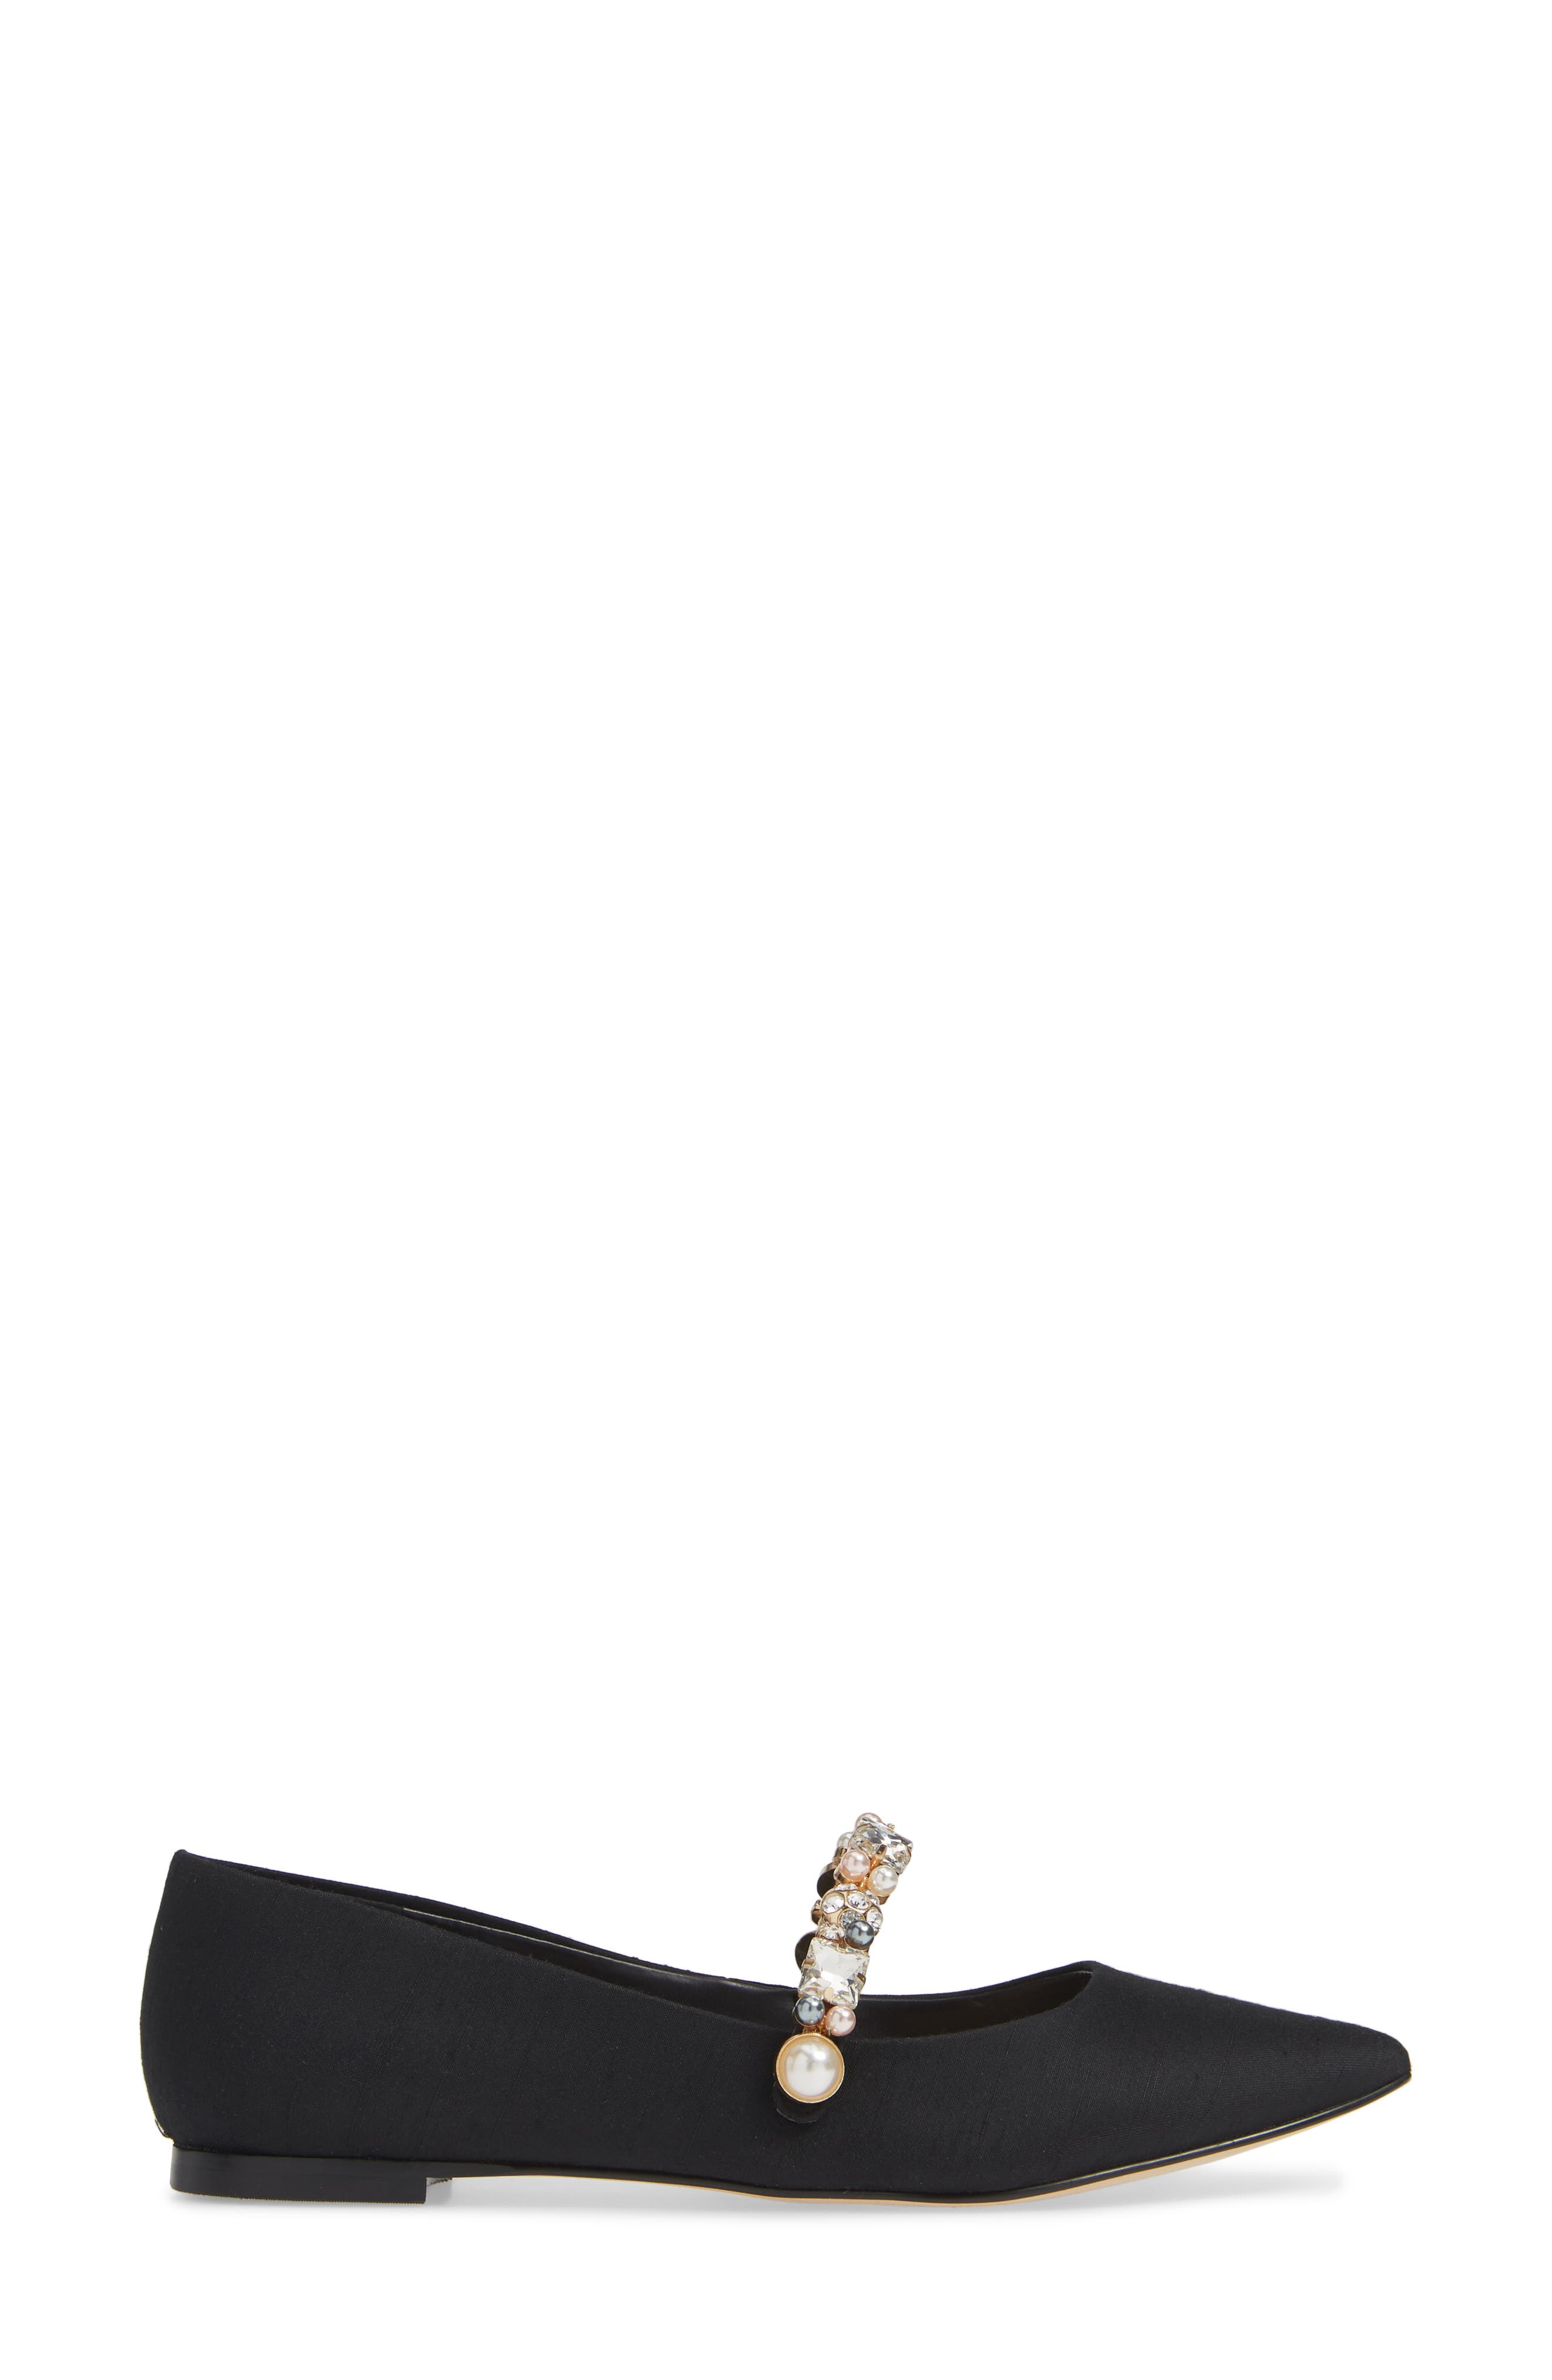 KARL LAGERFELD PARIS,                             Noel Imitation Pearl Embellished Flat,                             Alternate thumbnail 3, color,                             001